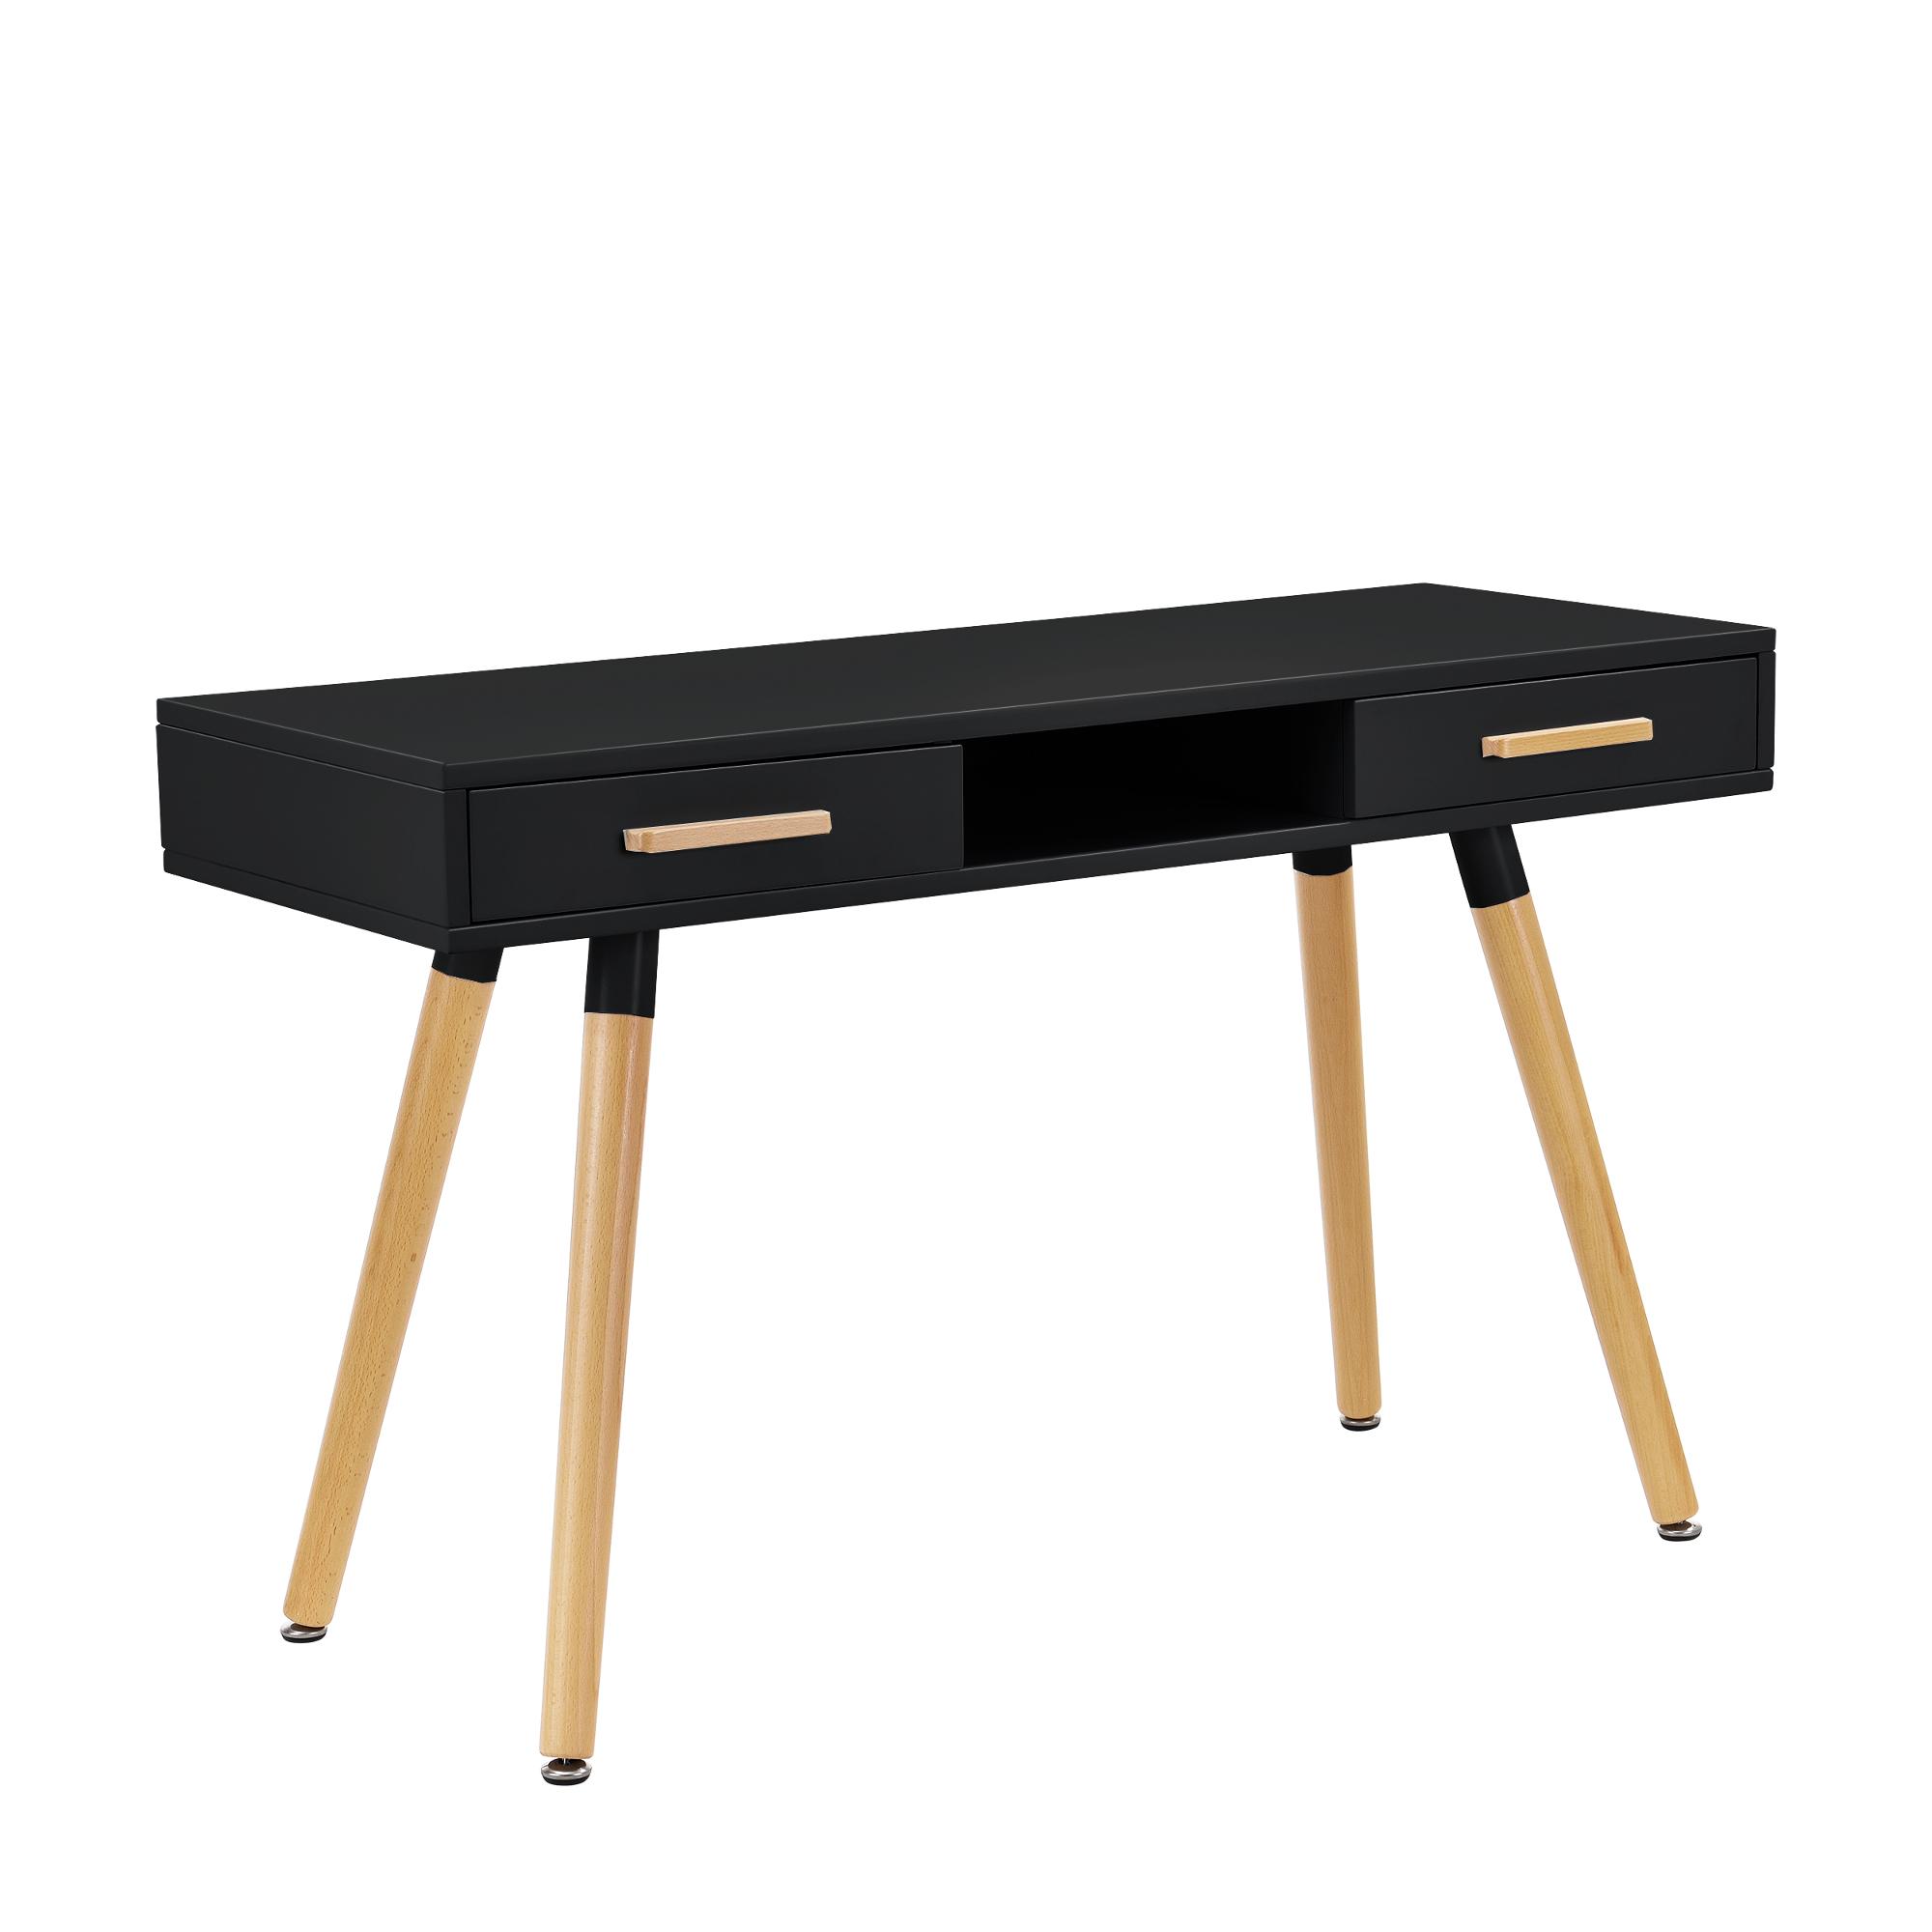 [en.casa]® Birou retro cu sertar si scaun, MDF/plastic, 75 x 120 x 45 cm, negru/alb